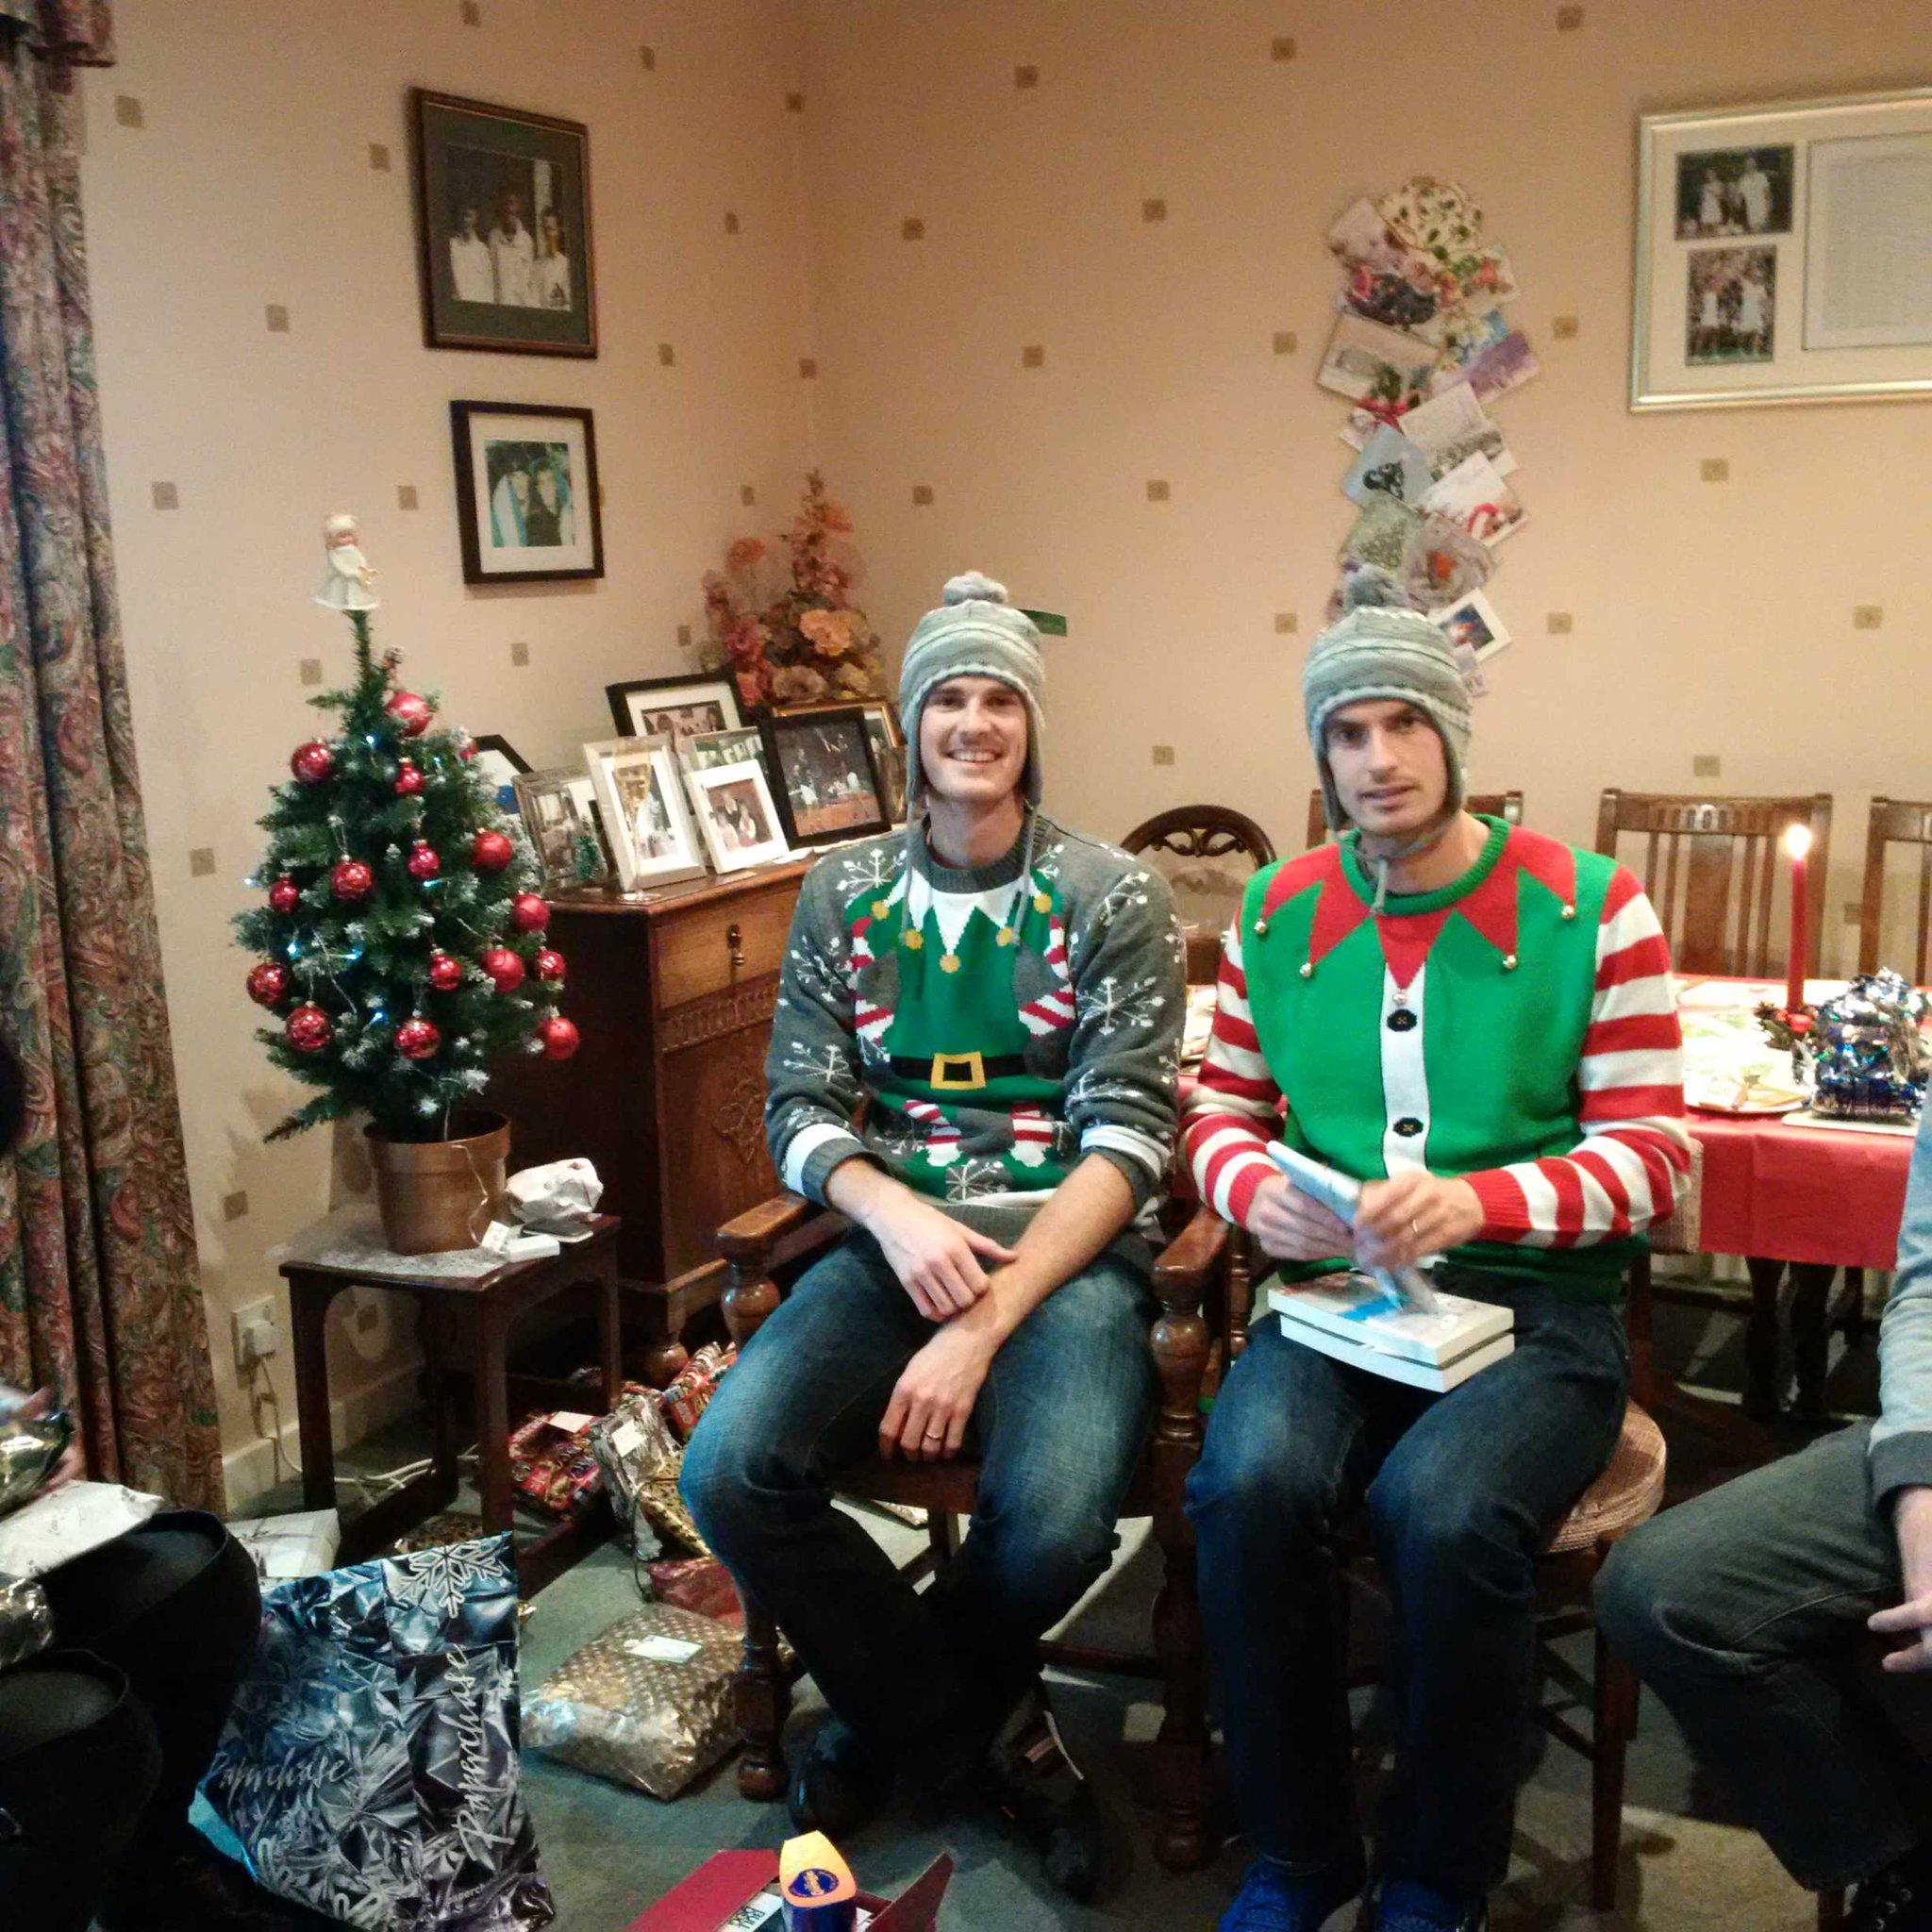 Andy murray twitter - Judy Murray On Twitter Having A Very Murray Christmas X Https T Co Bi5shupcox